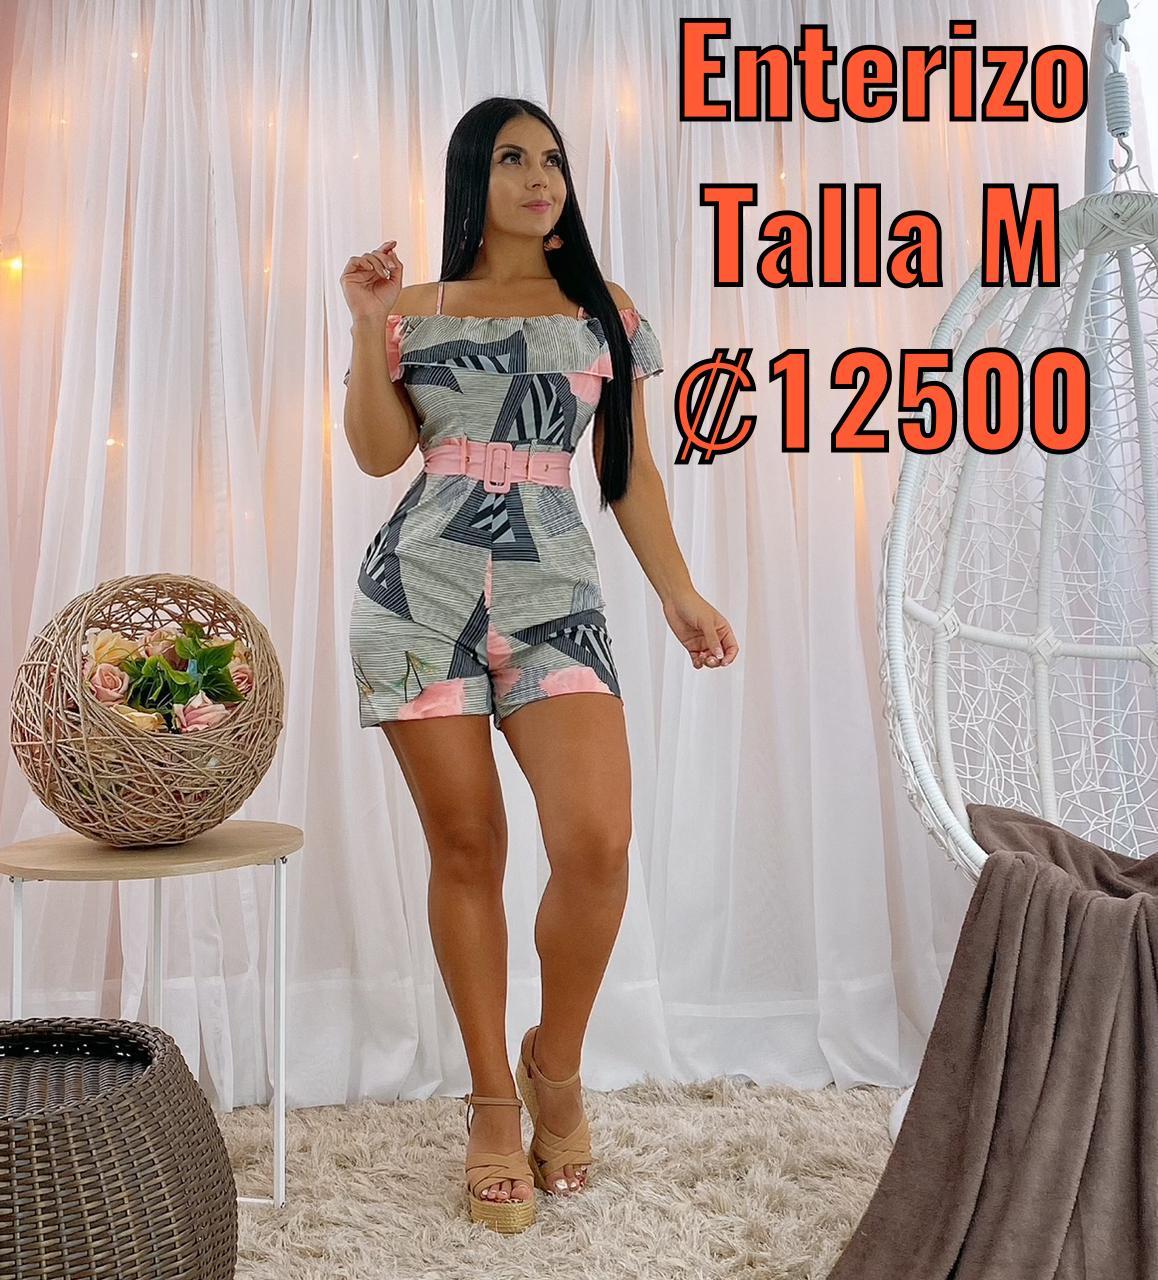 Se vende Hermoso Enterizo